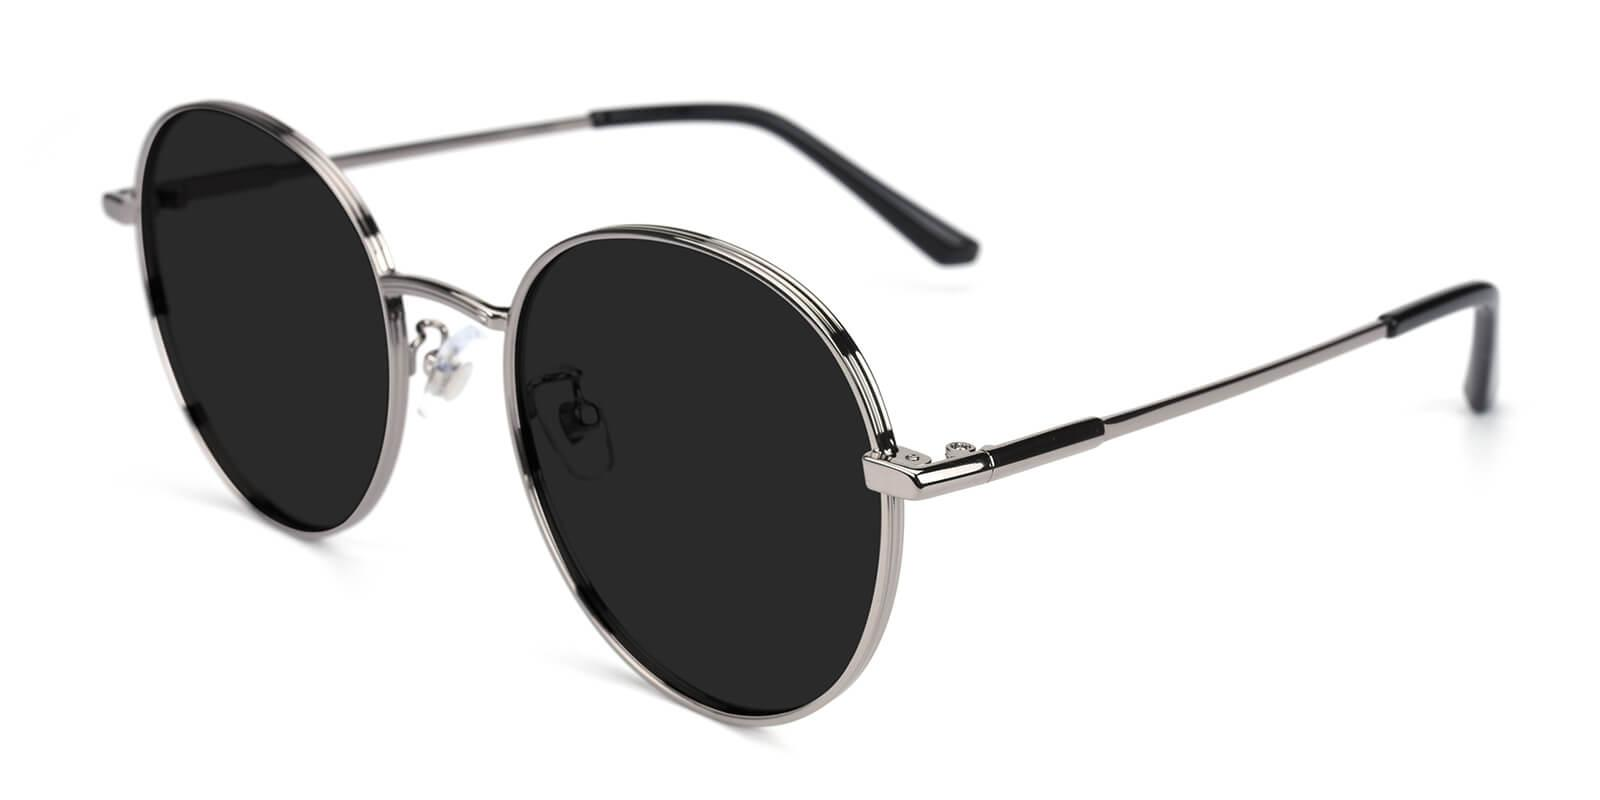 Krueger-Gun-Round-Metal-Sunglasses-detail